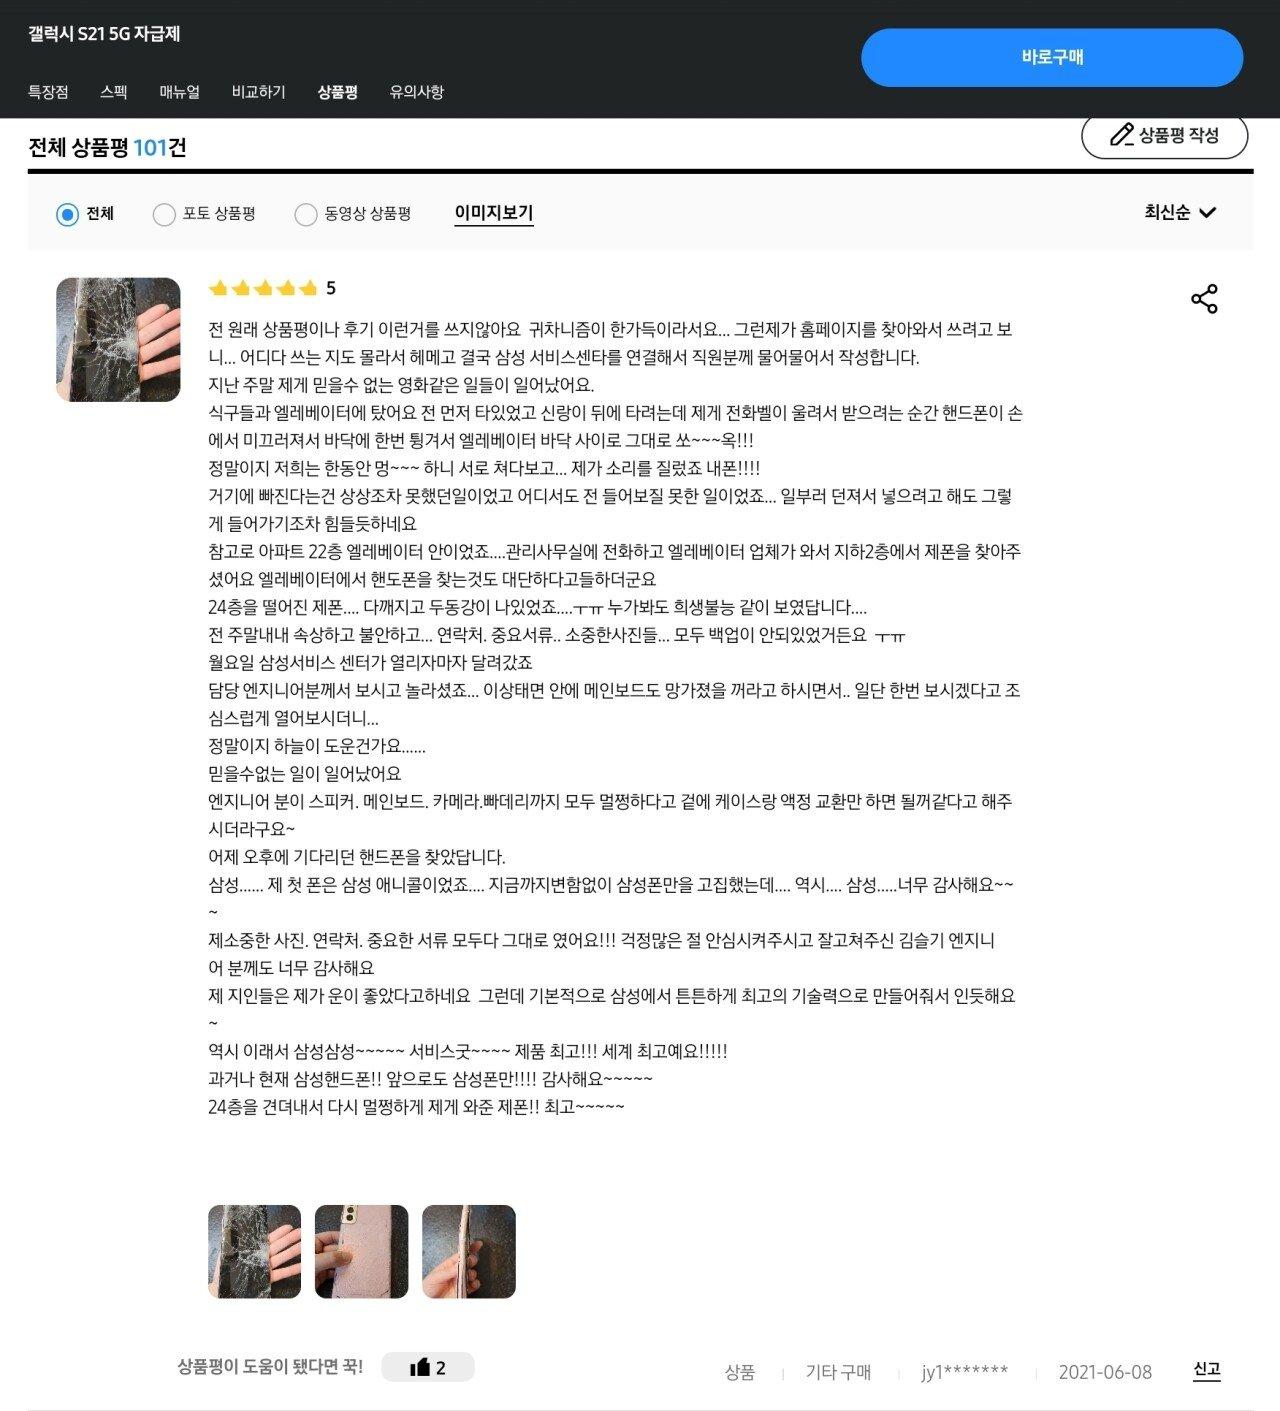 Screenshot_20210612-124940_Chrome.jpg 삼성 갤럭시 s21 최신근황. (미친 내구성ㄷㄷㄷ)